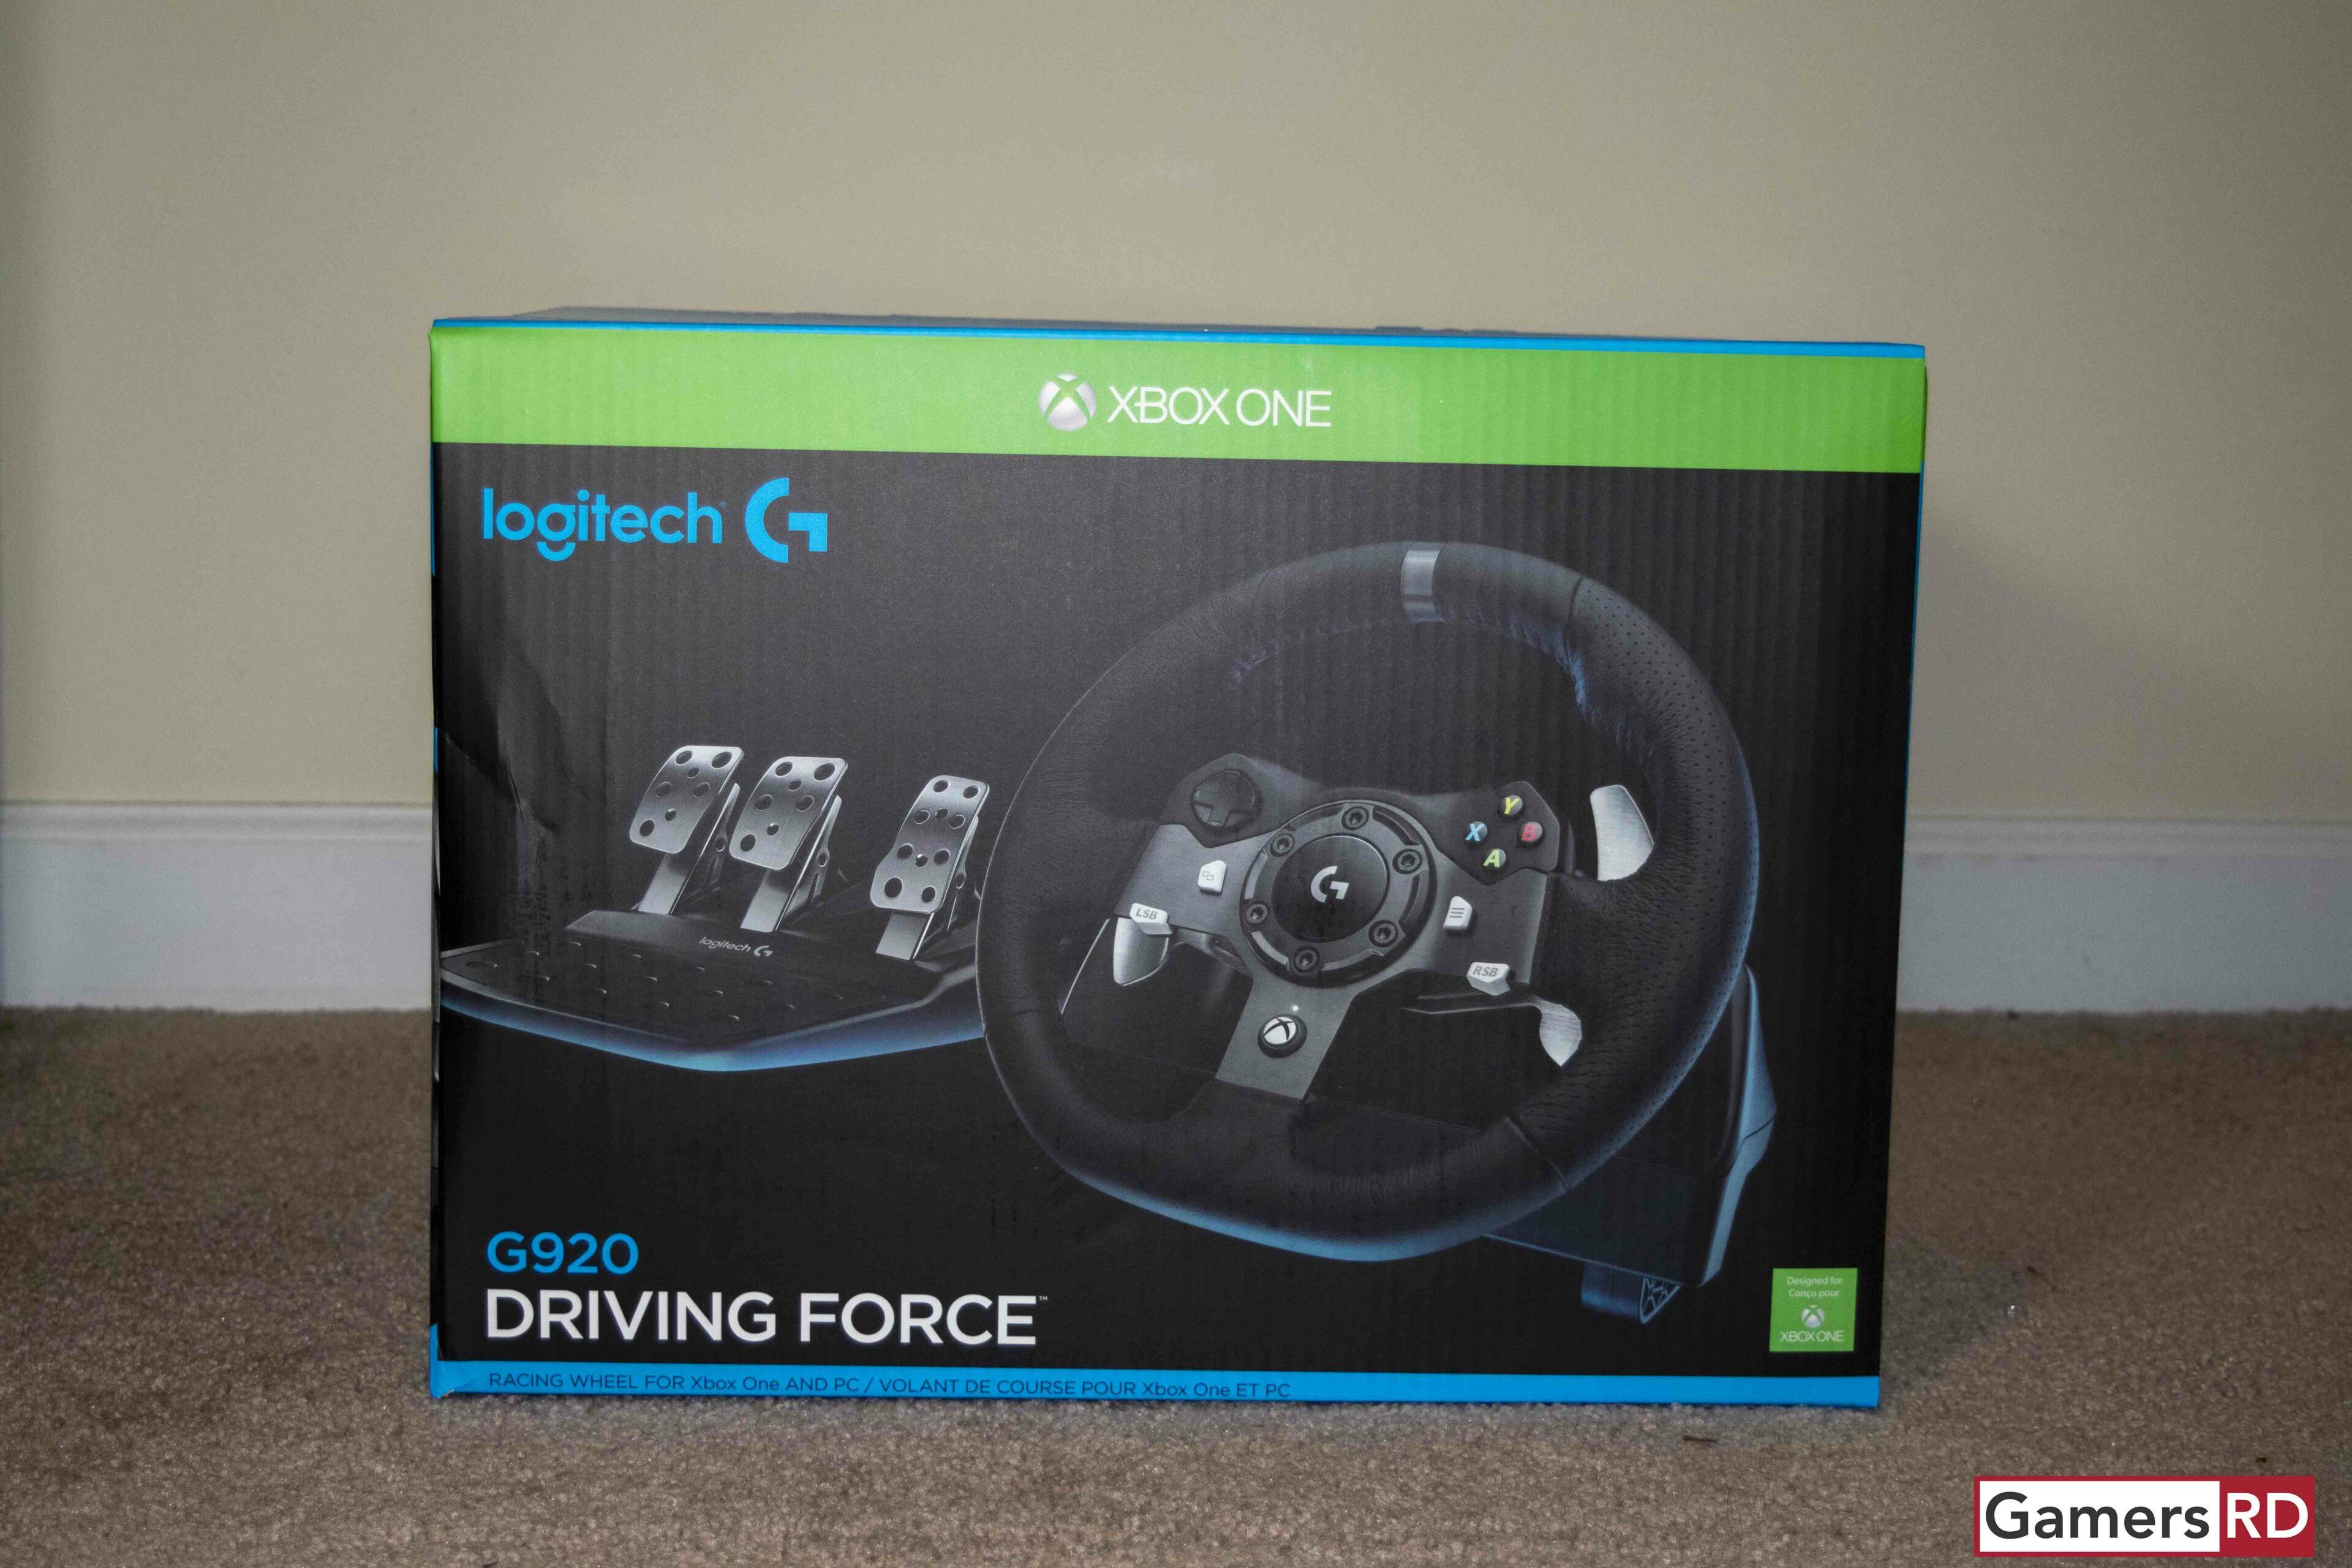 Logitech G920 Driving Force Racing Wheel Review, GamerSRD